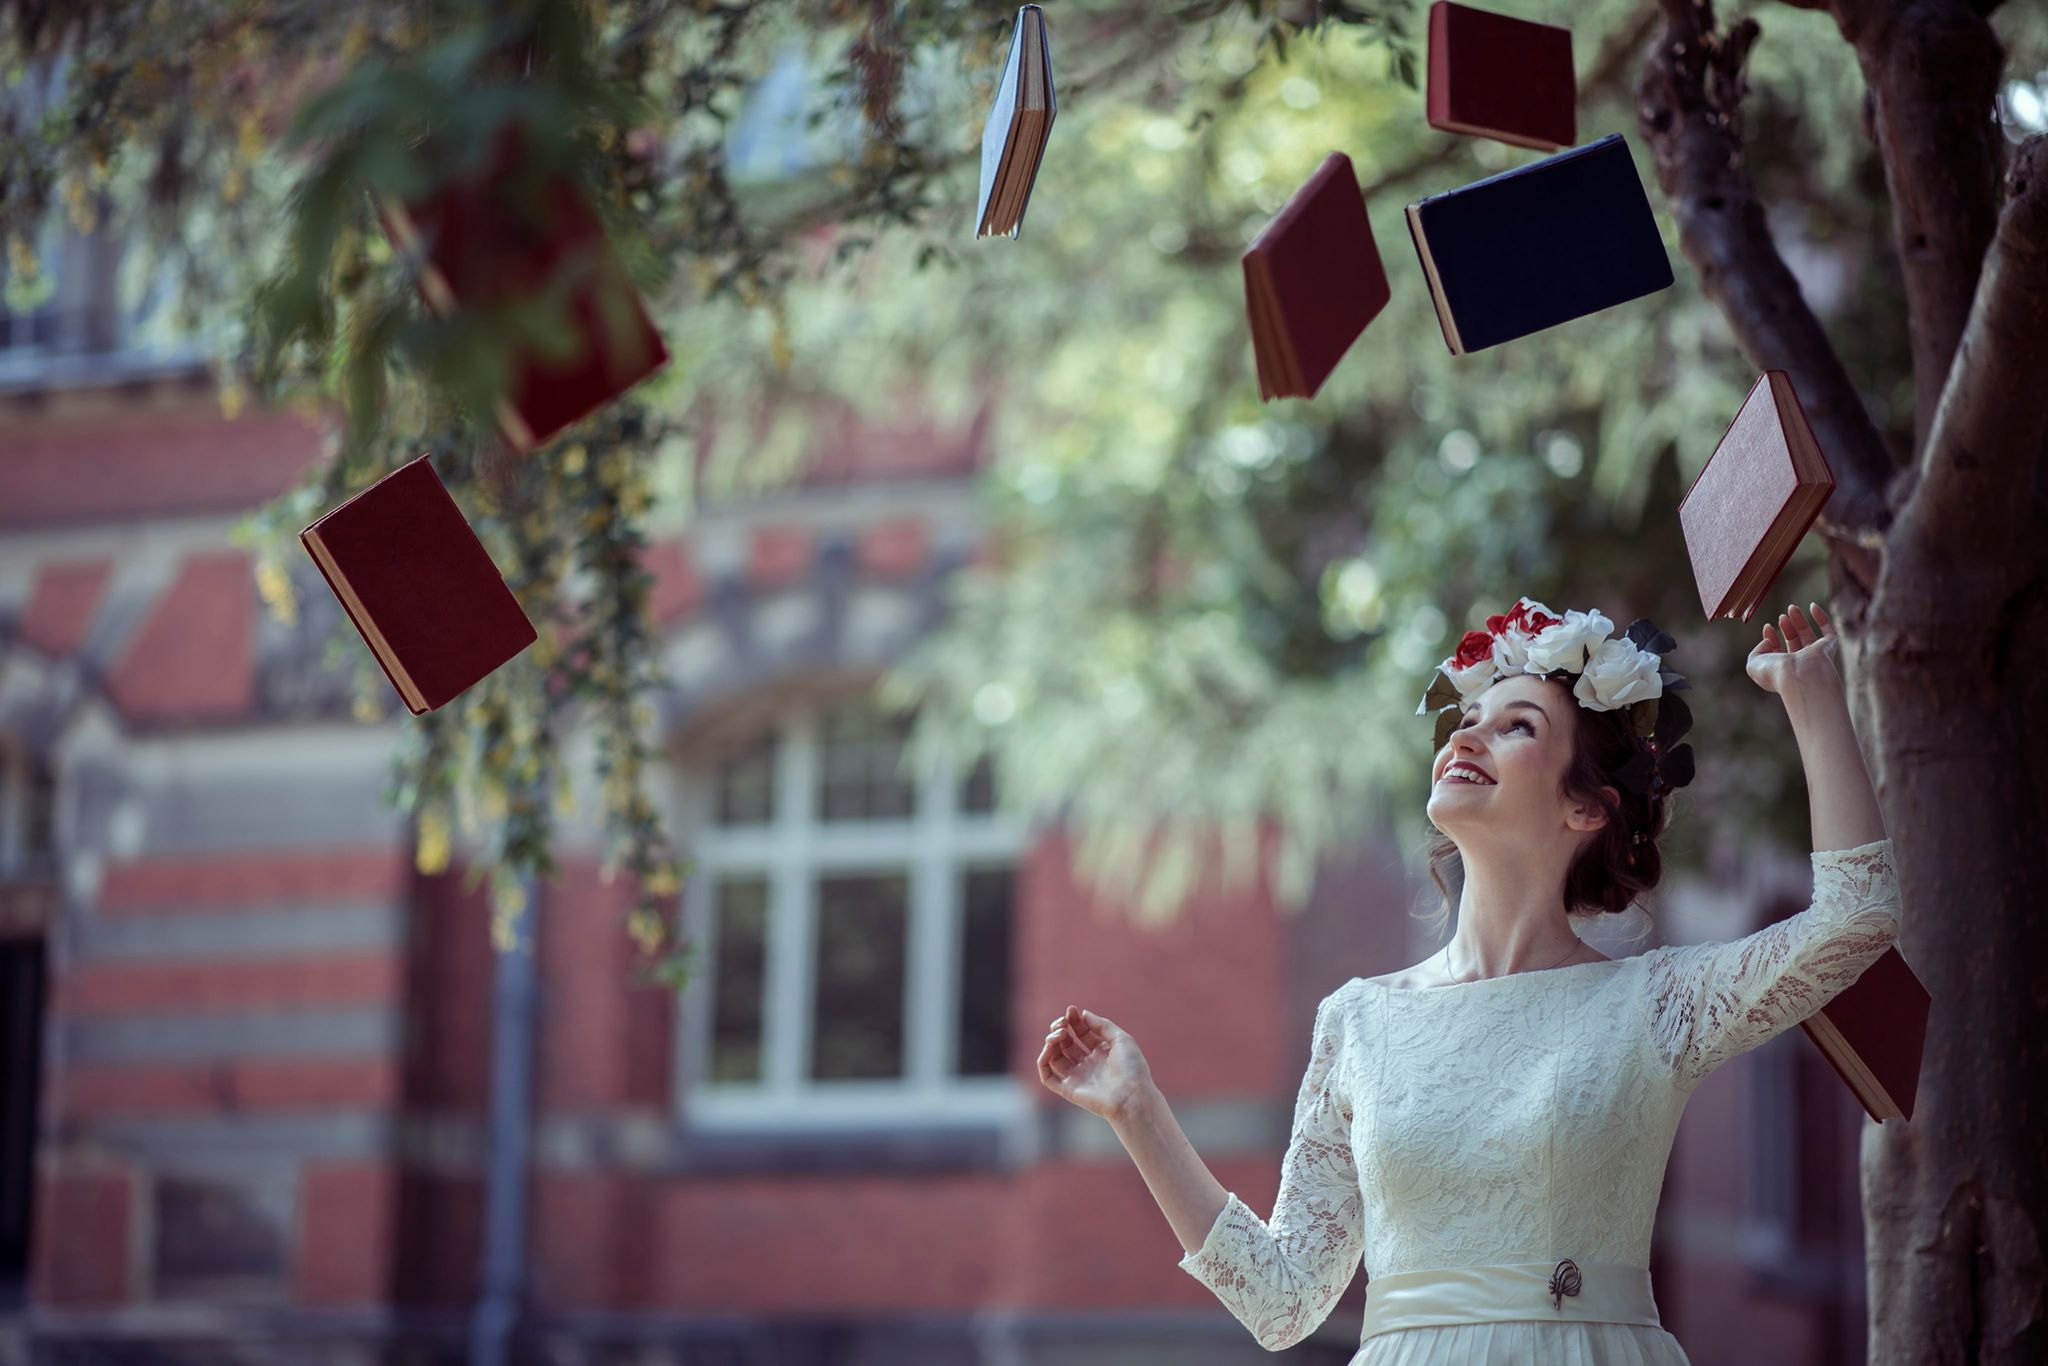 Alice in Wonderland wedding inspiration - flying books